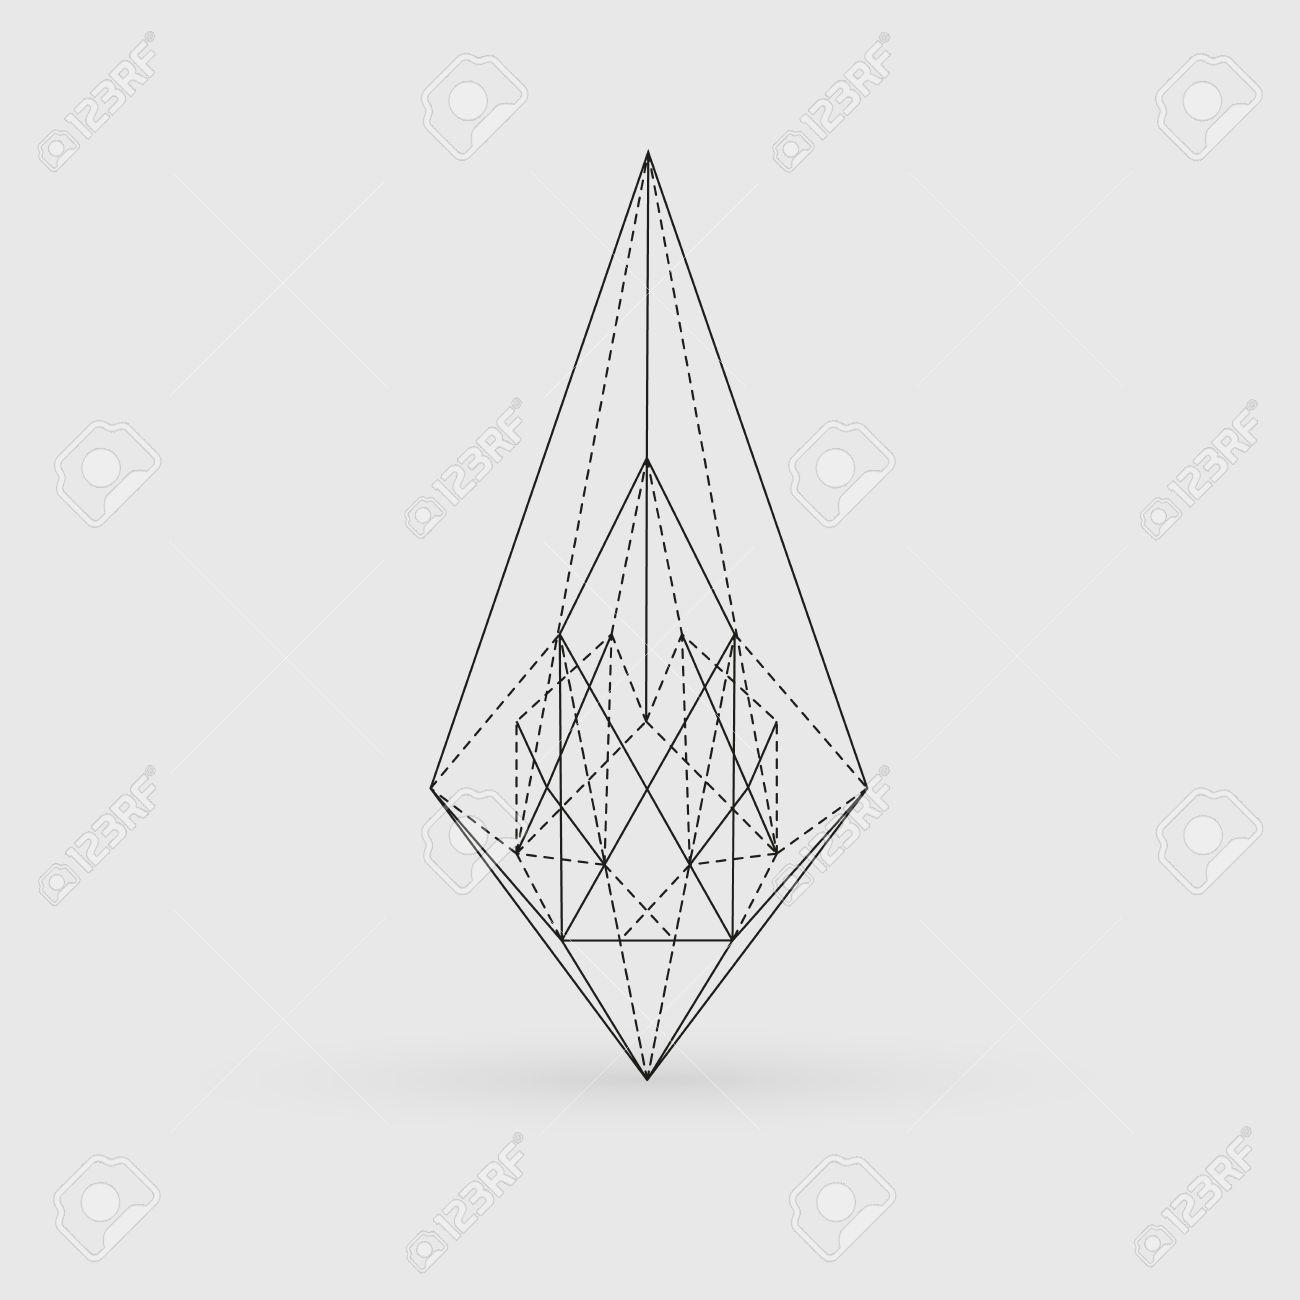 geometry design lines-#19